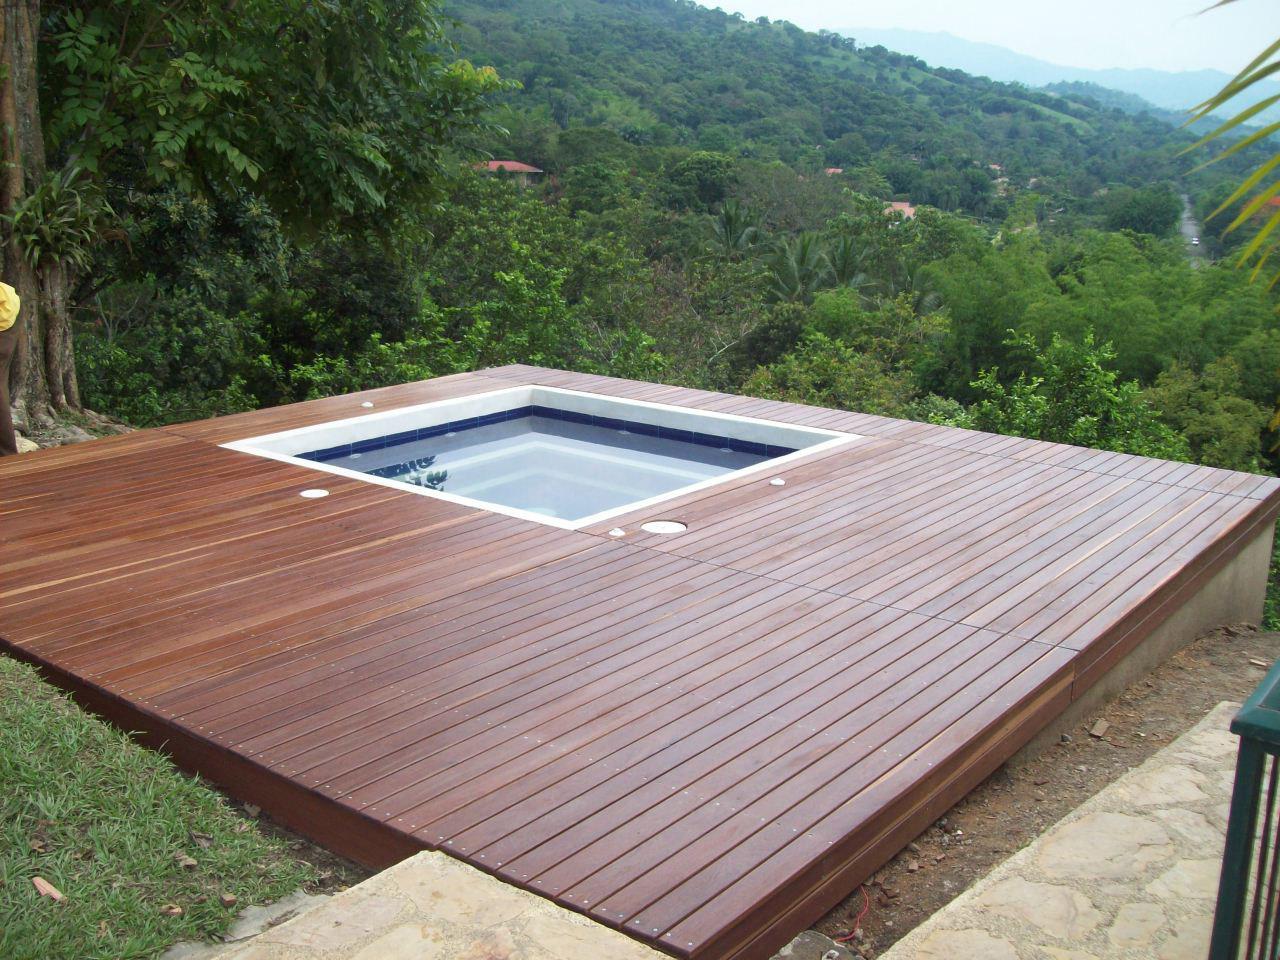 Maderas san jos deck - Maderas tropicales para exterior ...